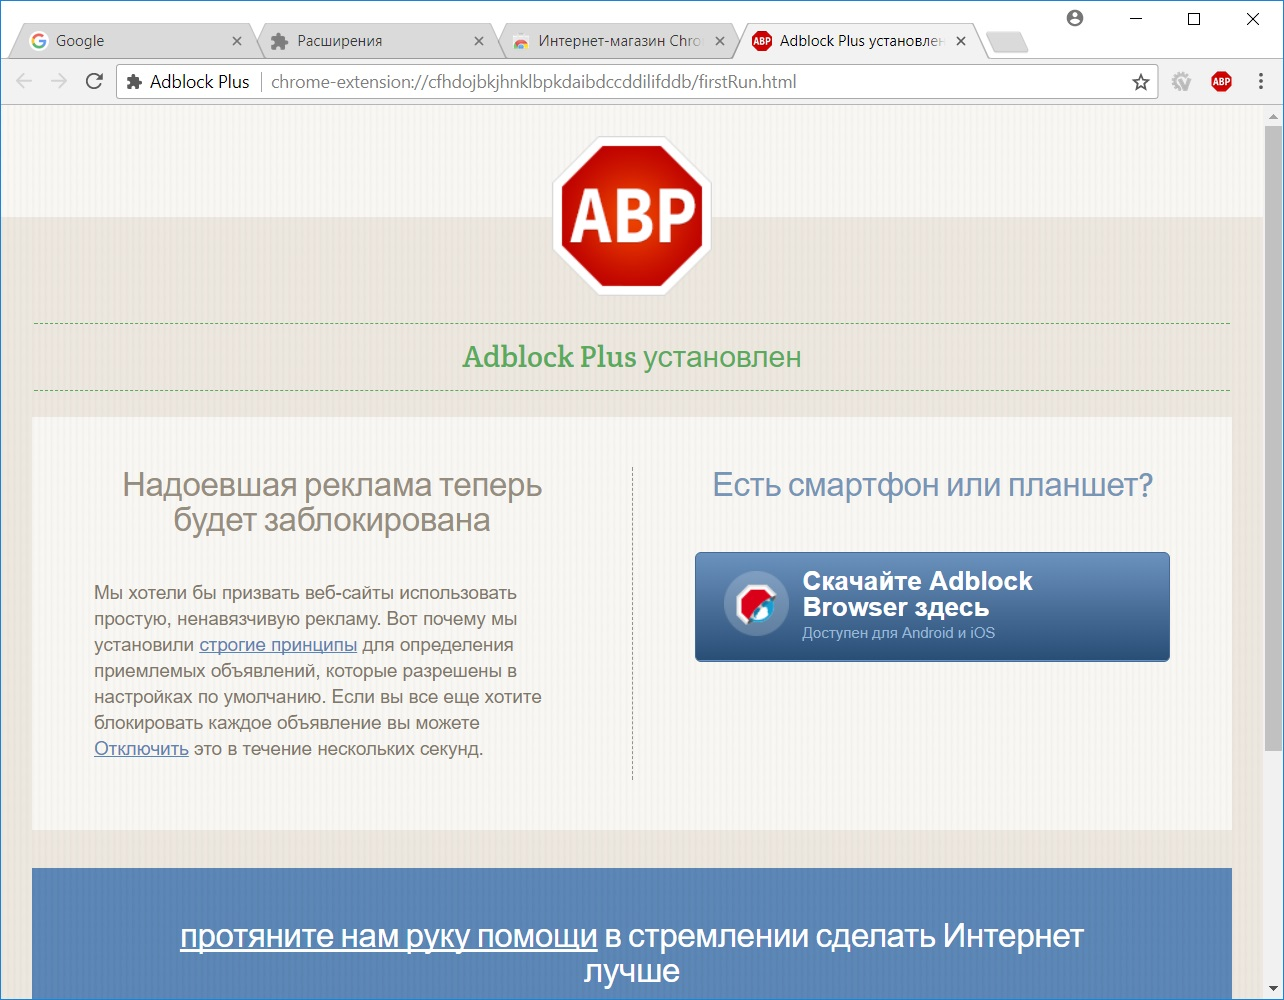 Adblock Plus установлен